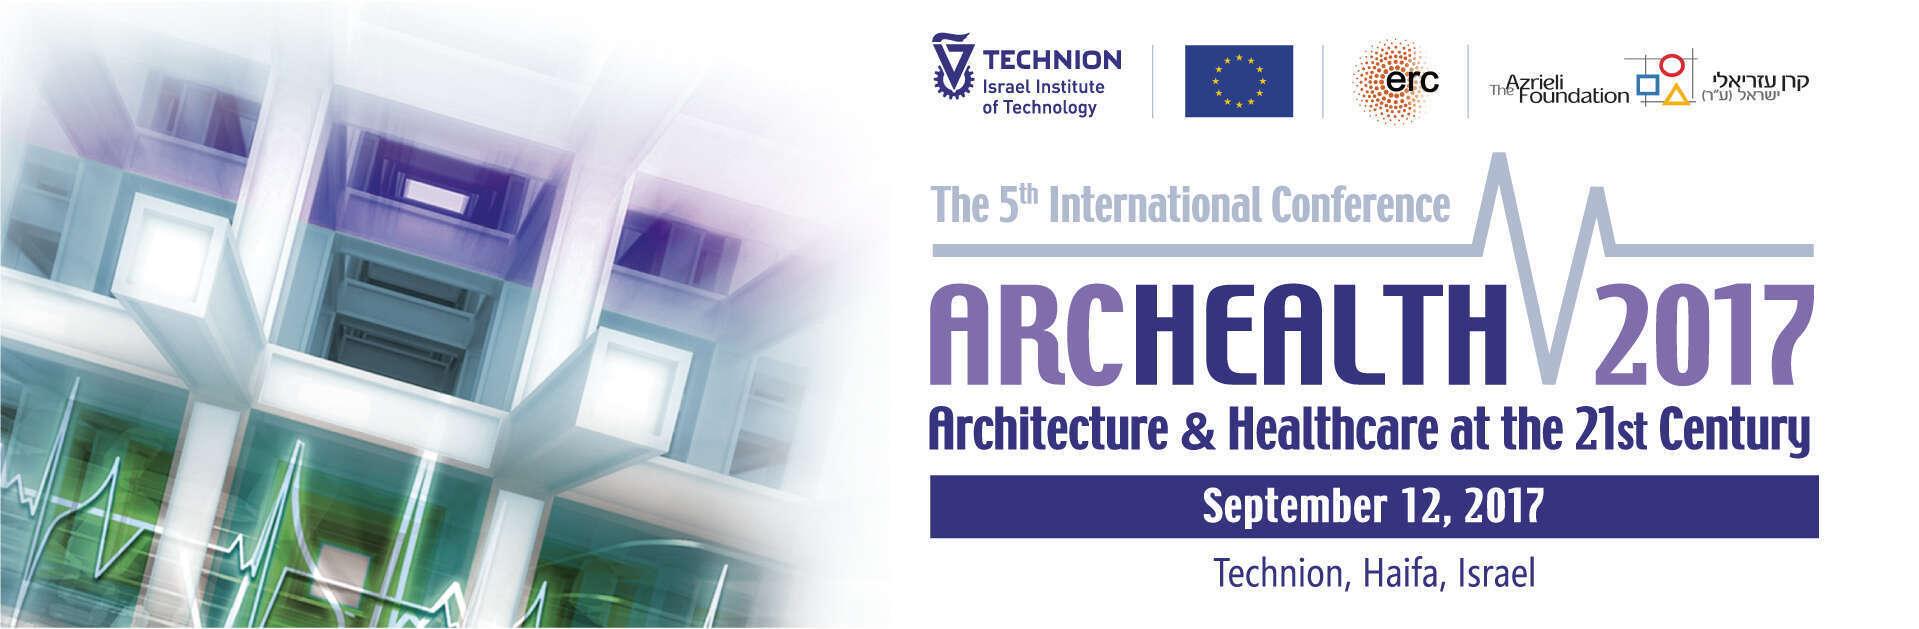 ARCHEALTH2017